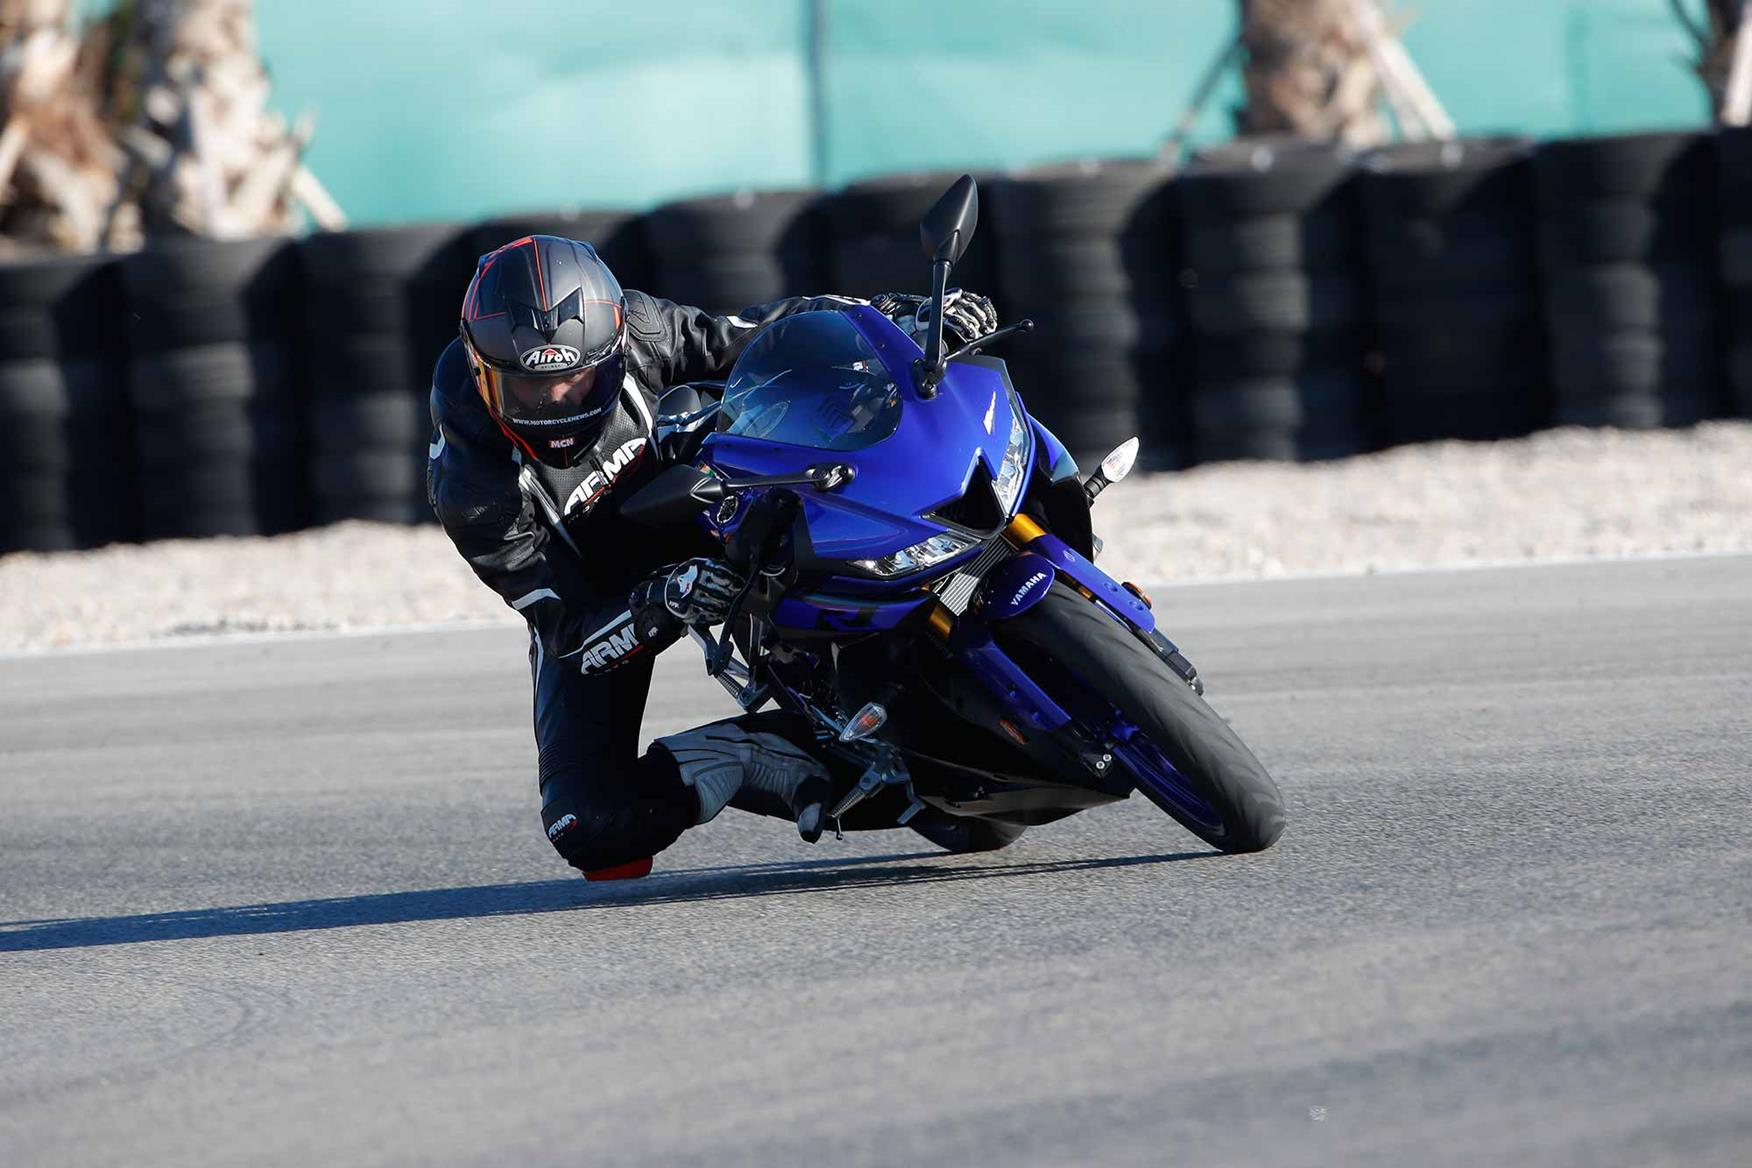 motogp 17 championship mod apk revdl